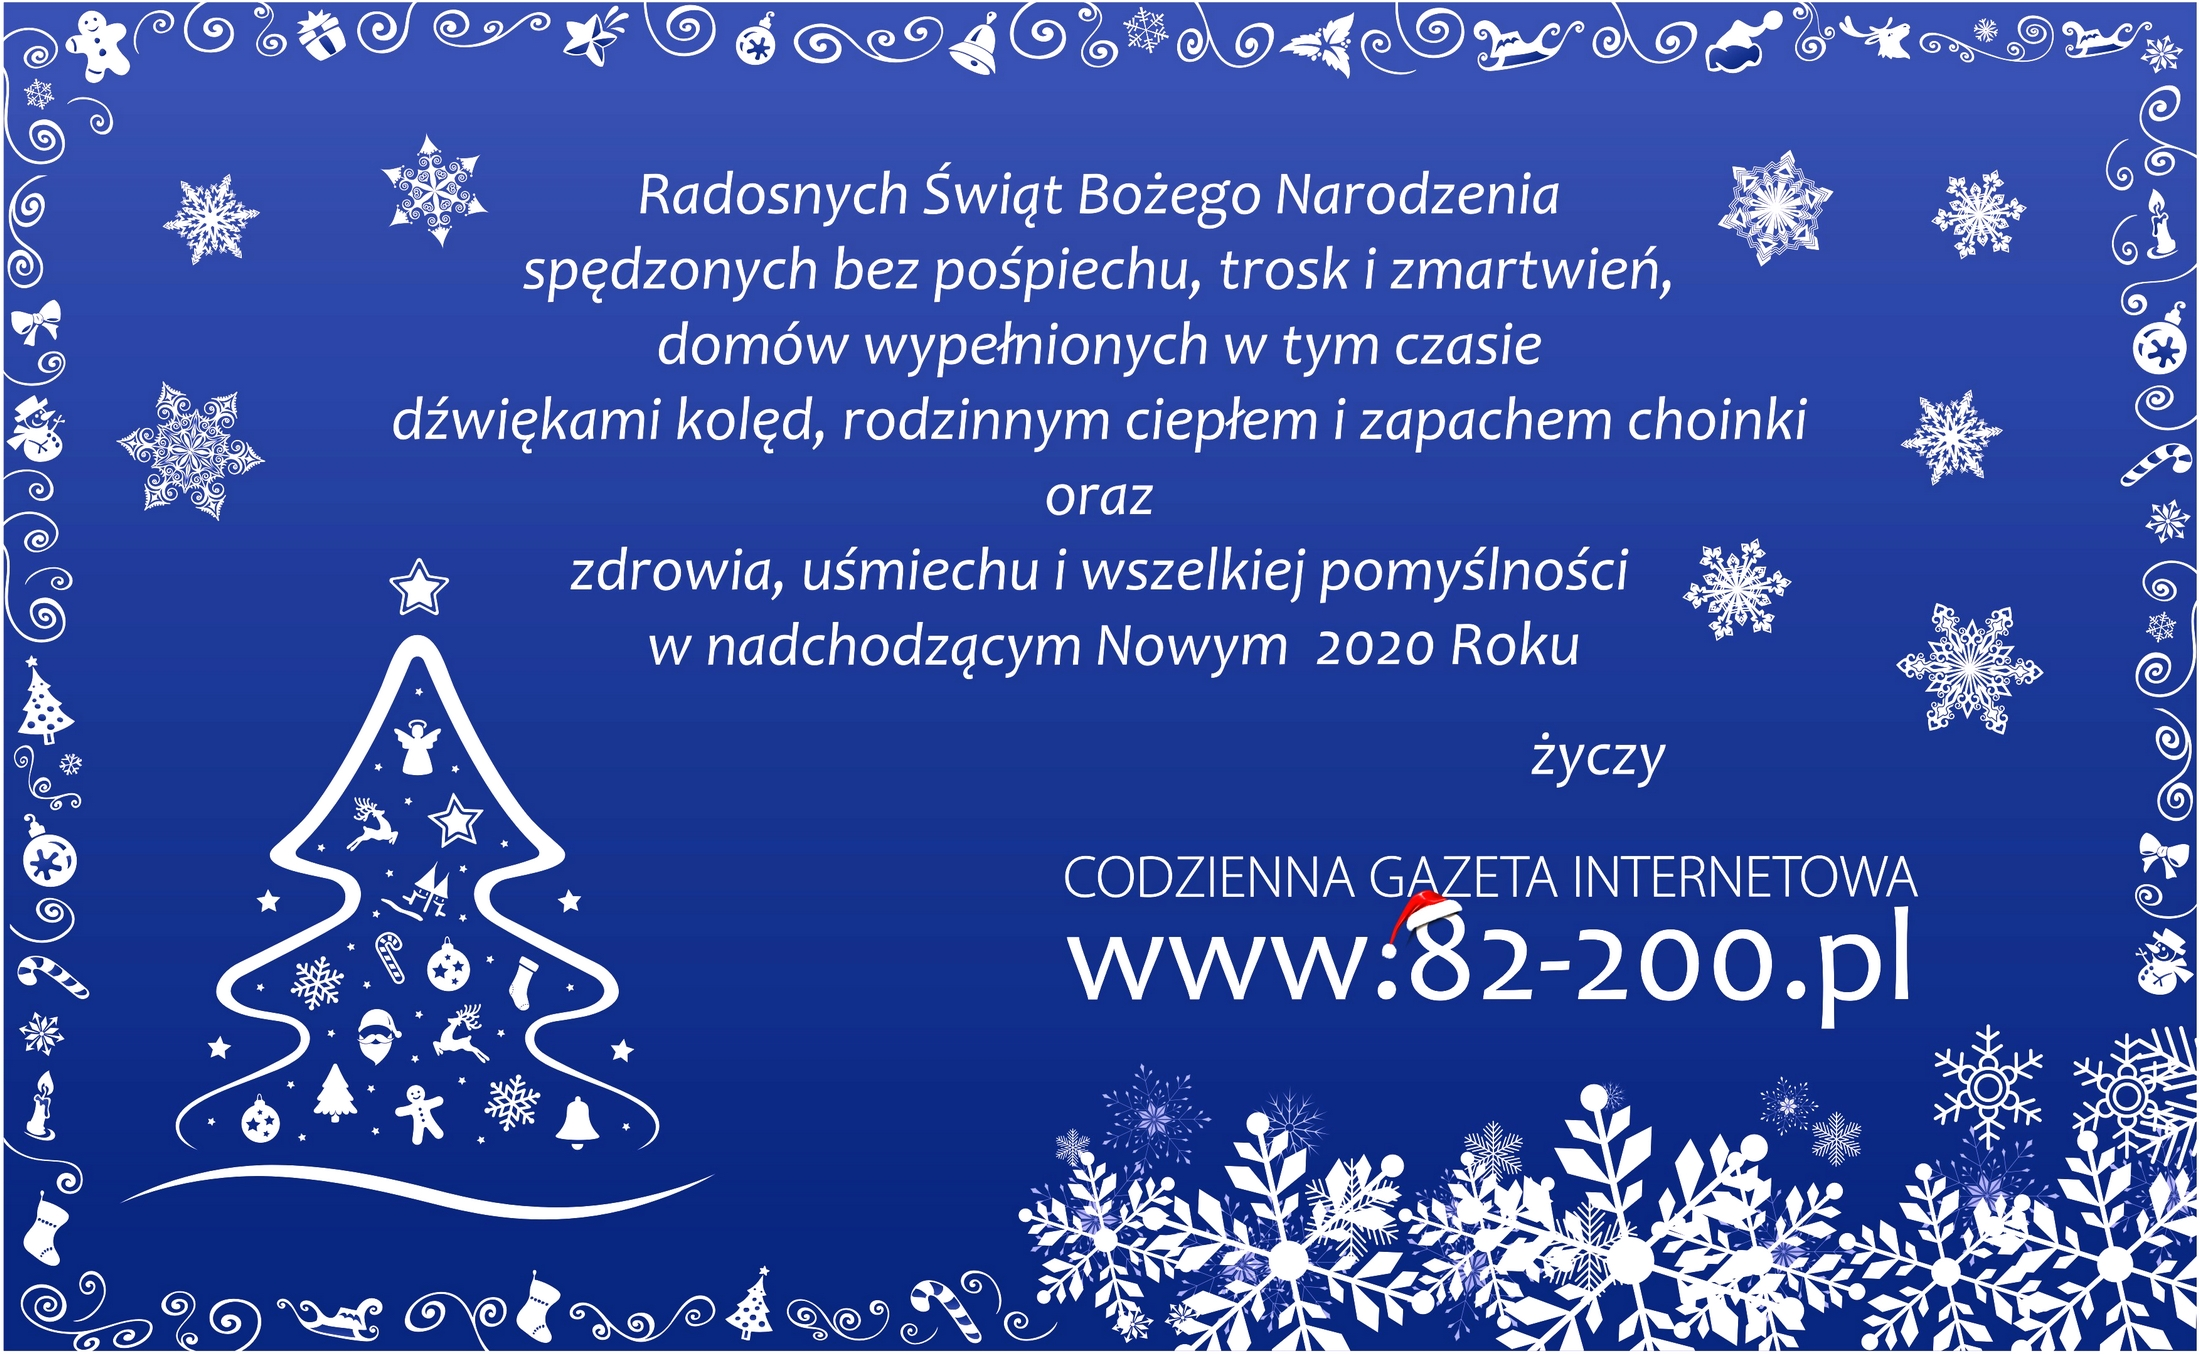 http://m.82-200.pl/2019/12/orig/82200-2019-card-5350.jpg